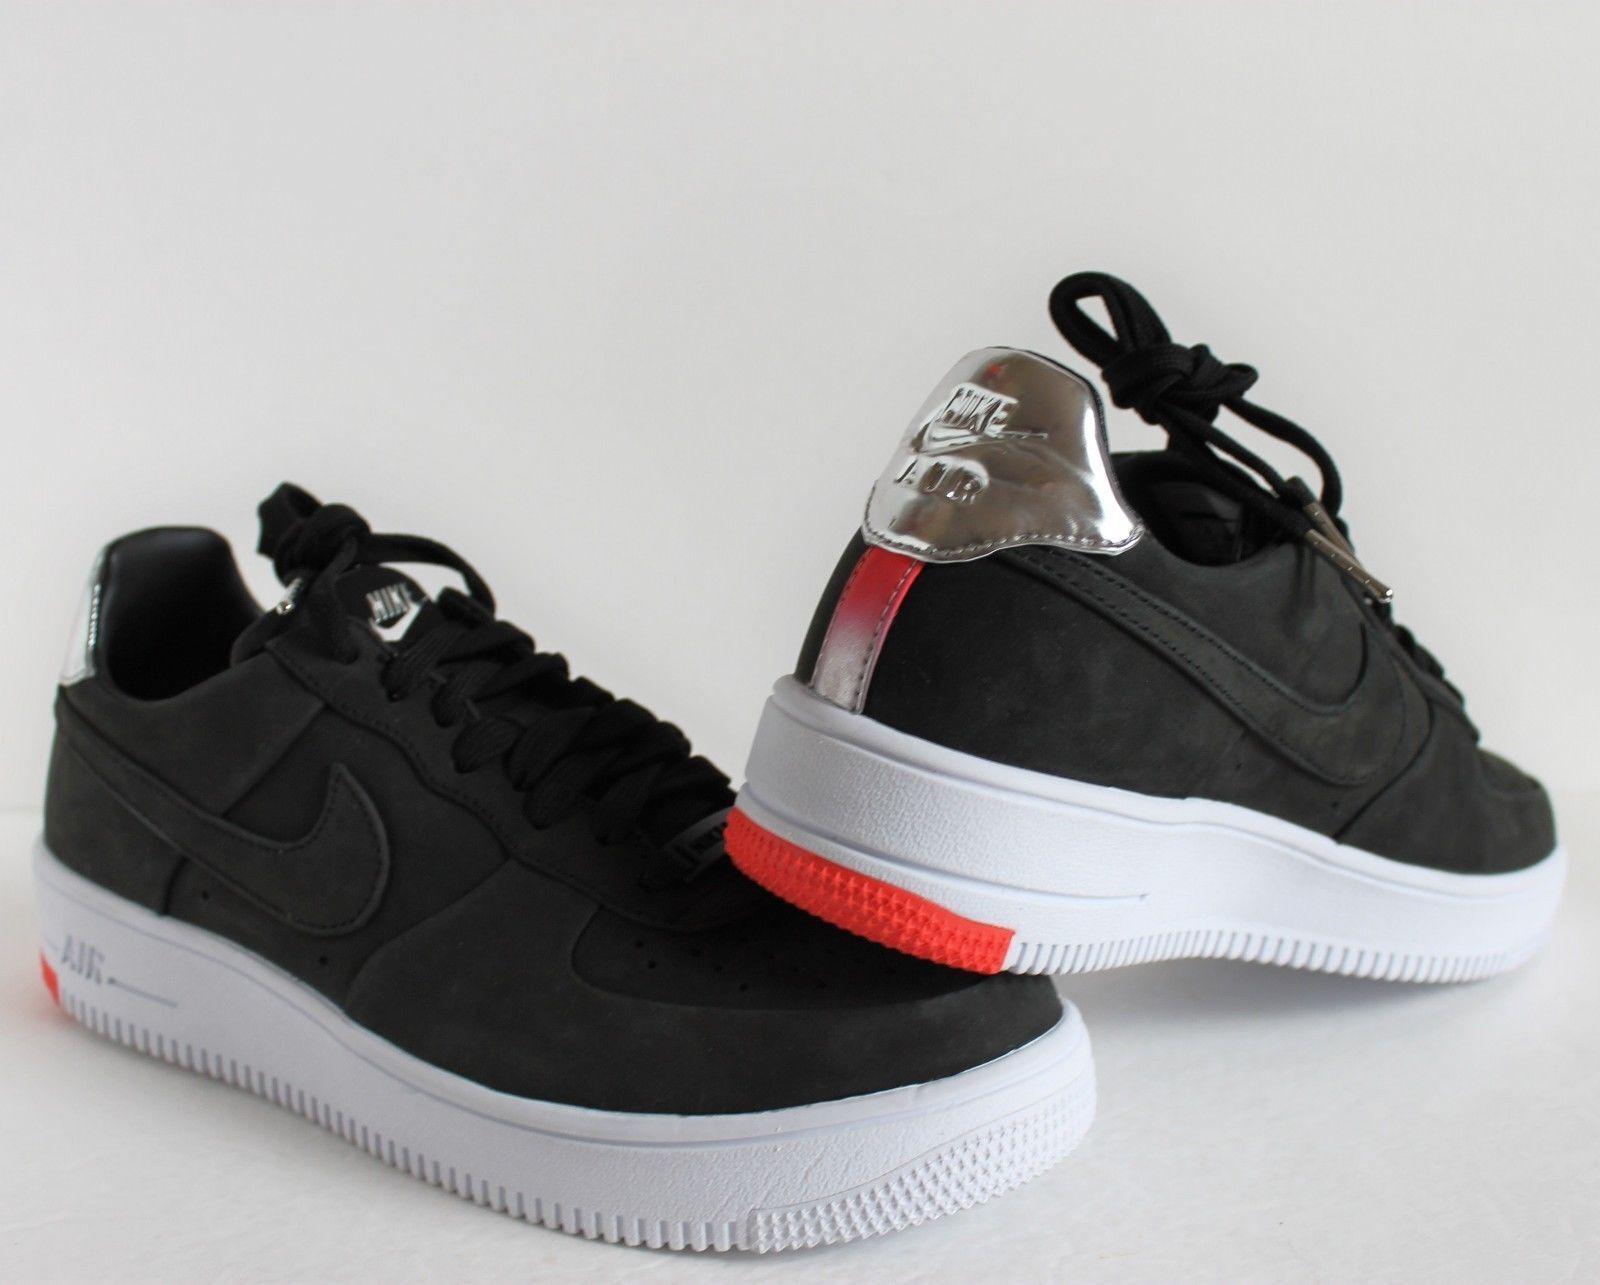 Nike Air Force 1 UltraForce FC QS Black/White 865306-001 Men's Shoes Size 11